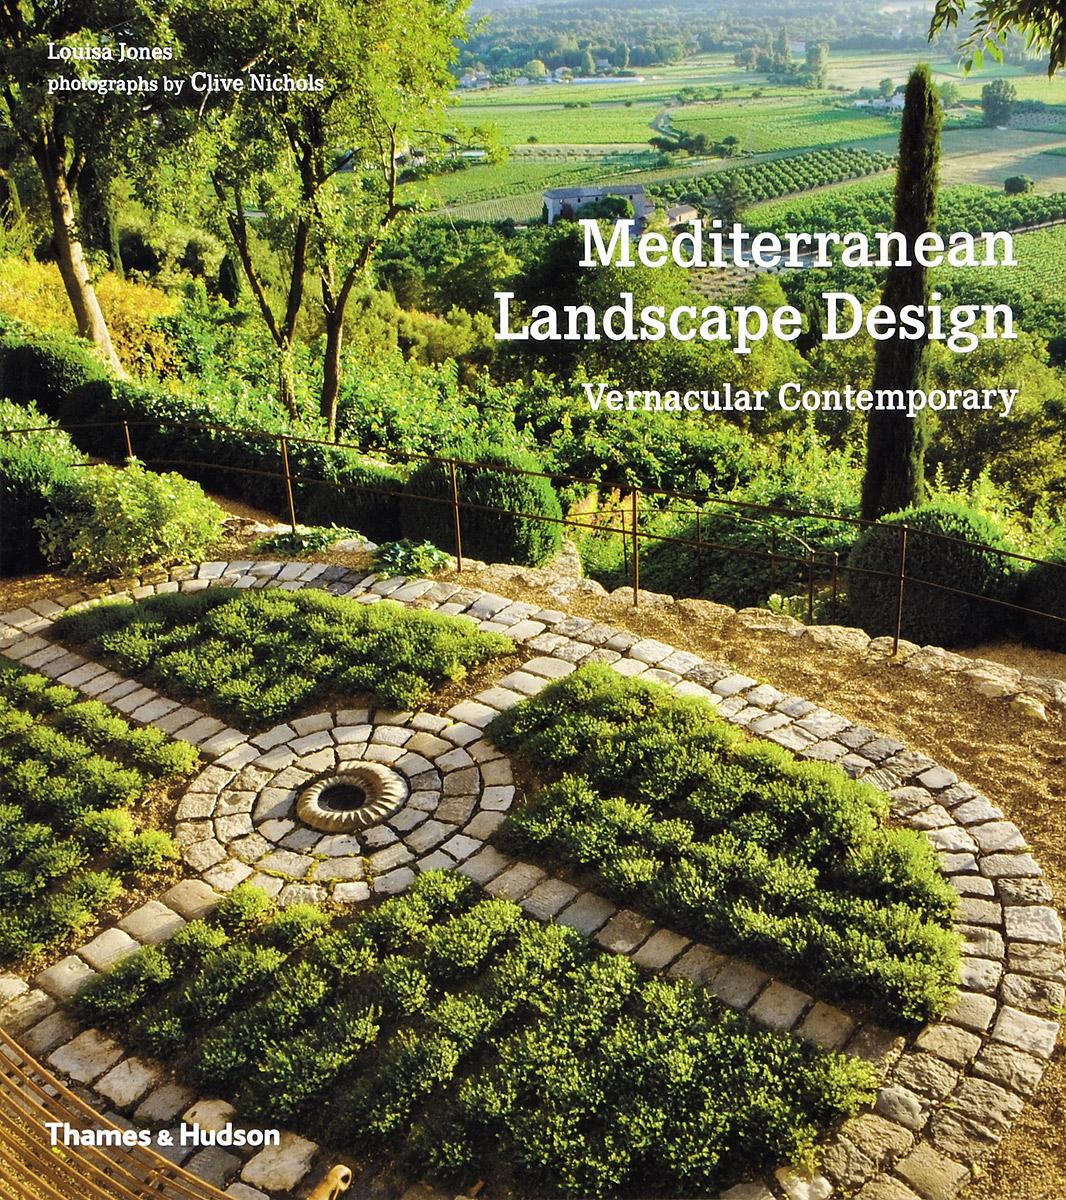 Mediterranean Landscape Design: Vernacular Contemporary linking landscape and species